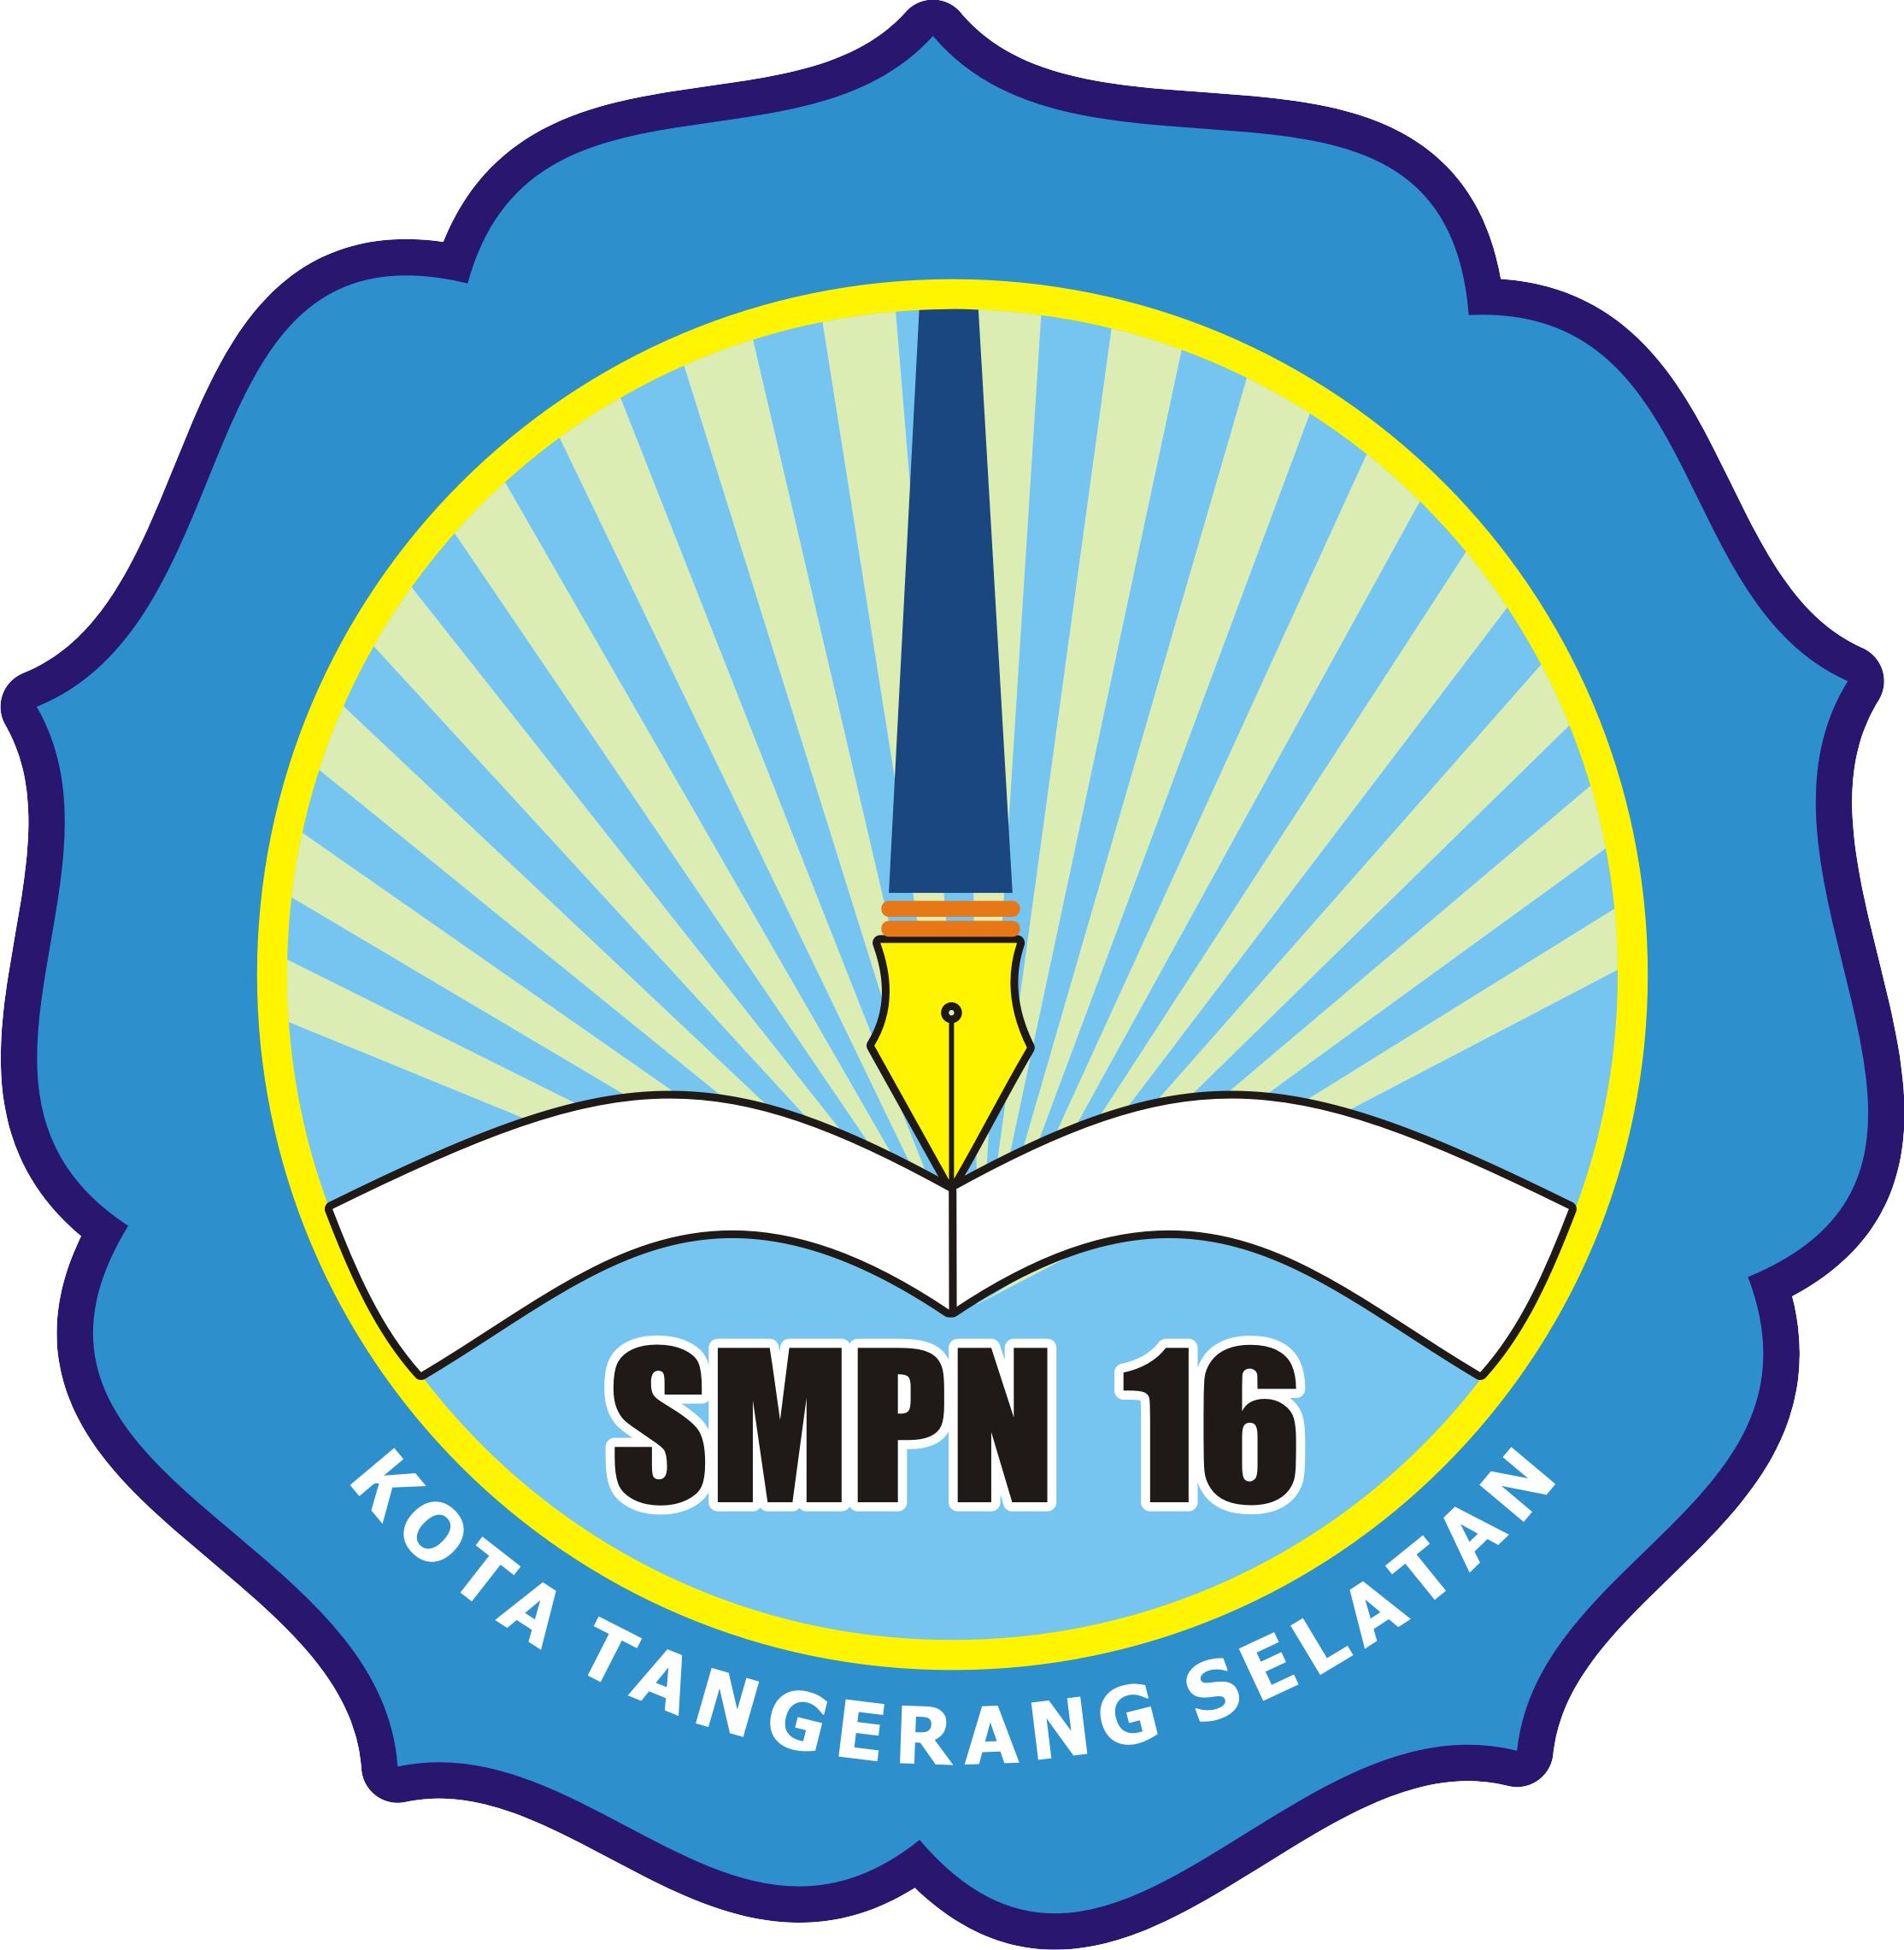 Smpn 16 Tangerang Selatan